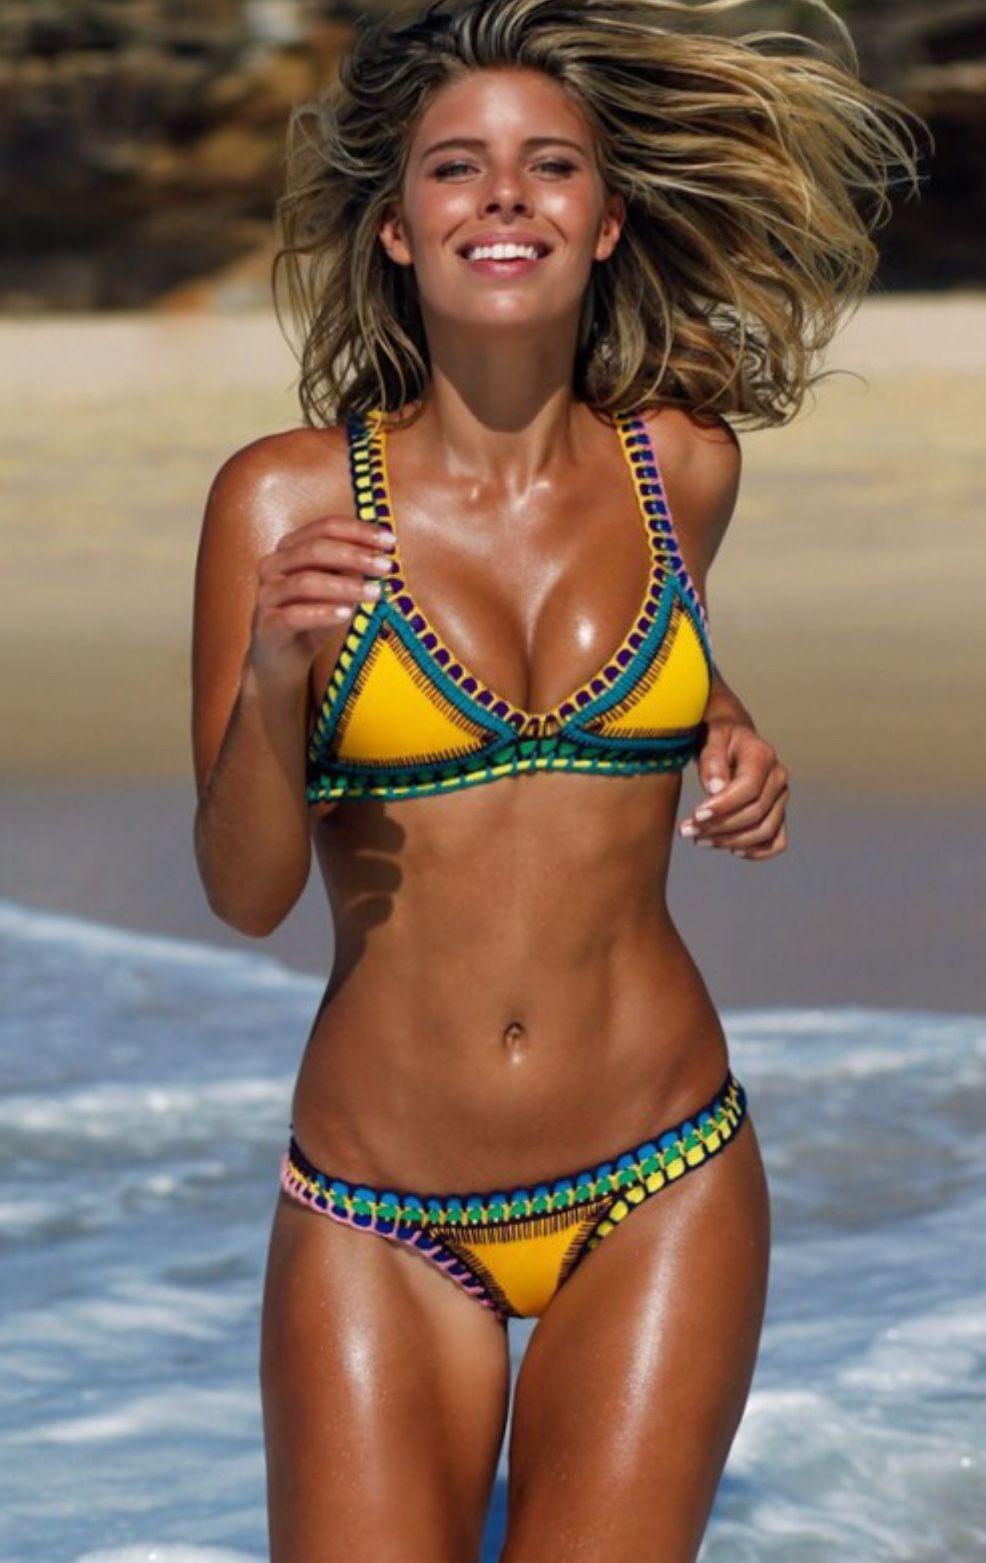 ef1b31ca4253a Neoprene crochet bikini purchased from Surin Beach shop Phuket Biquini  Neon